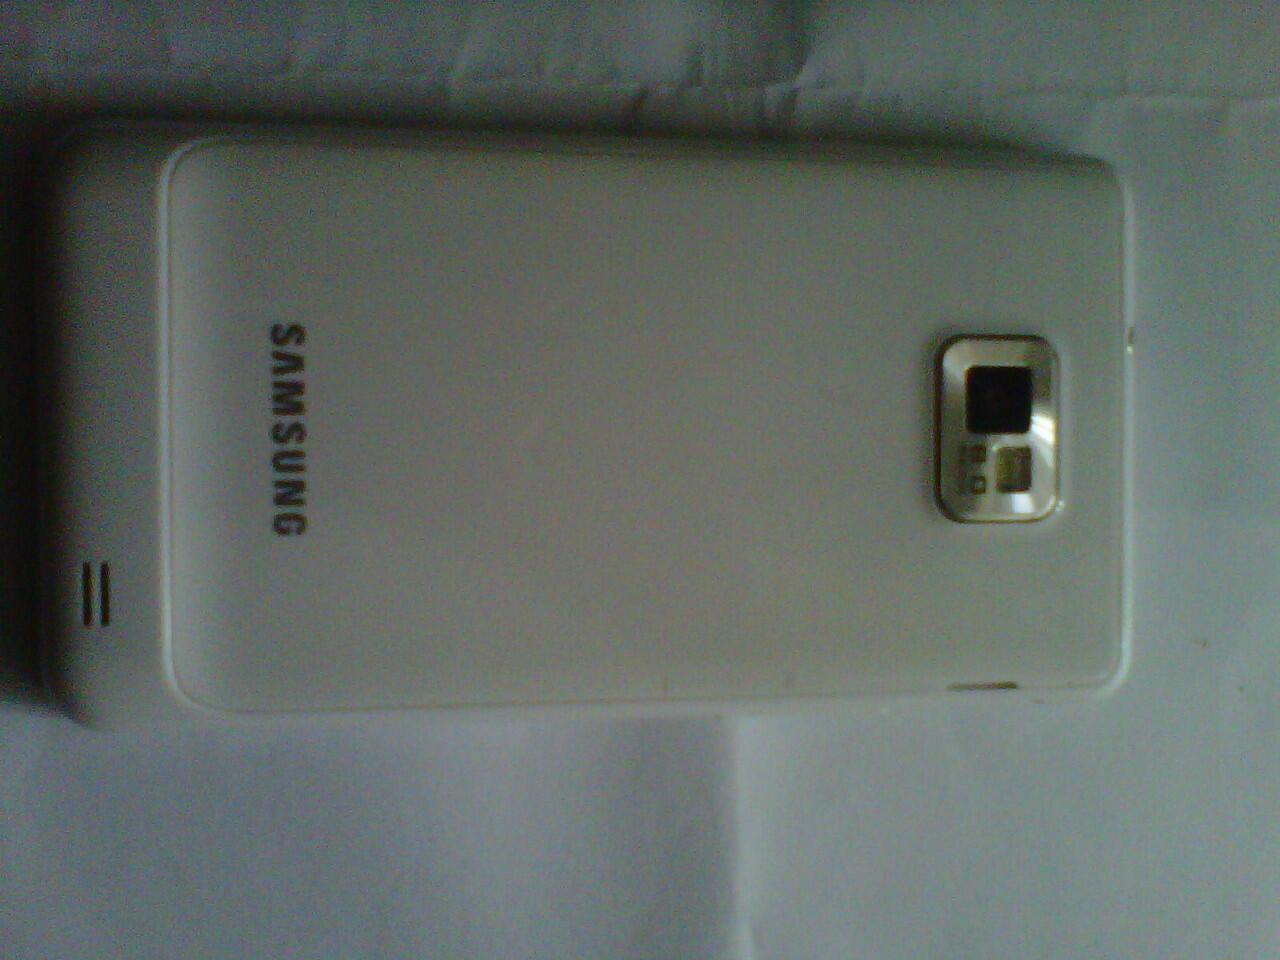 Jual Samsung Galaxy s2 / sii white Muluss 99%